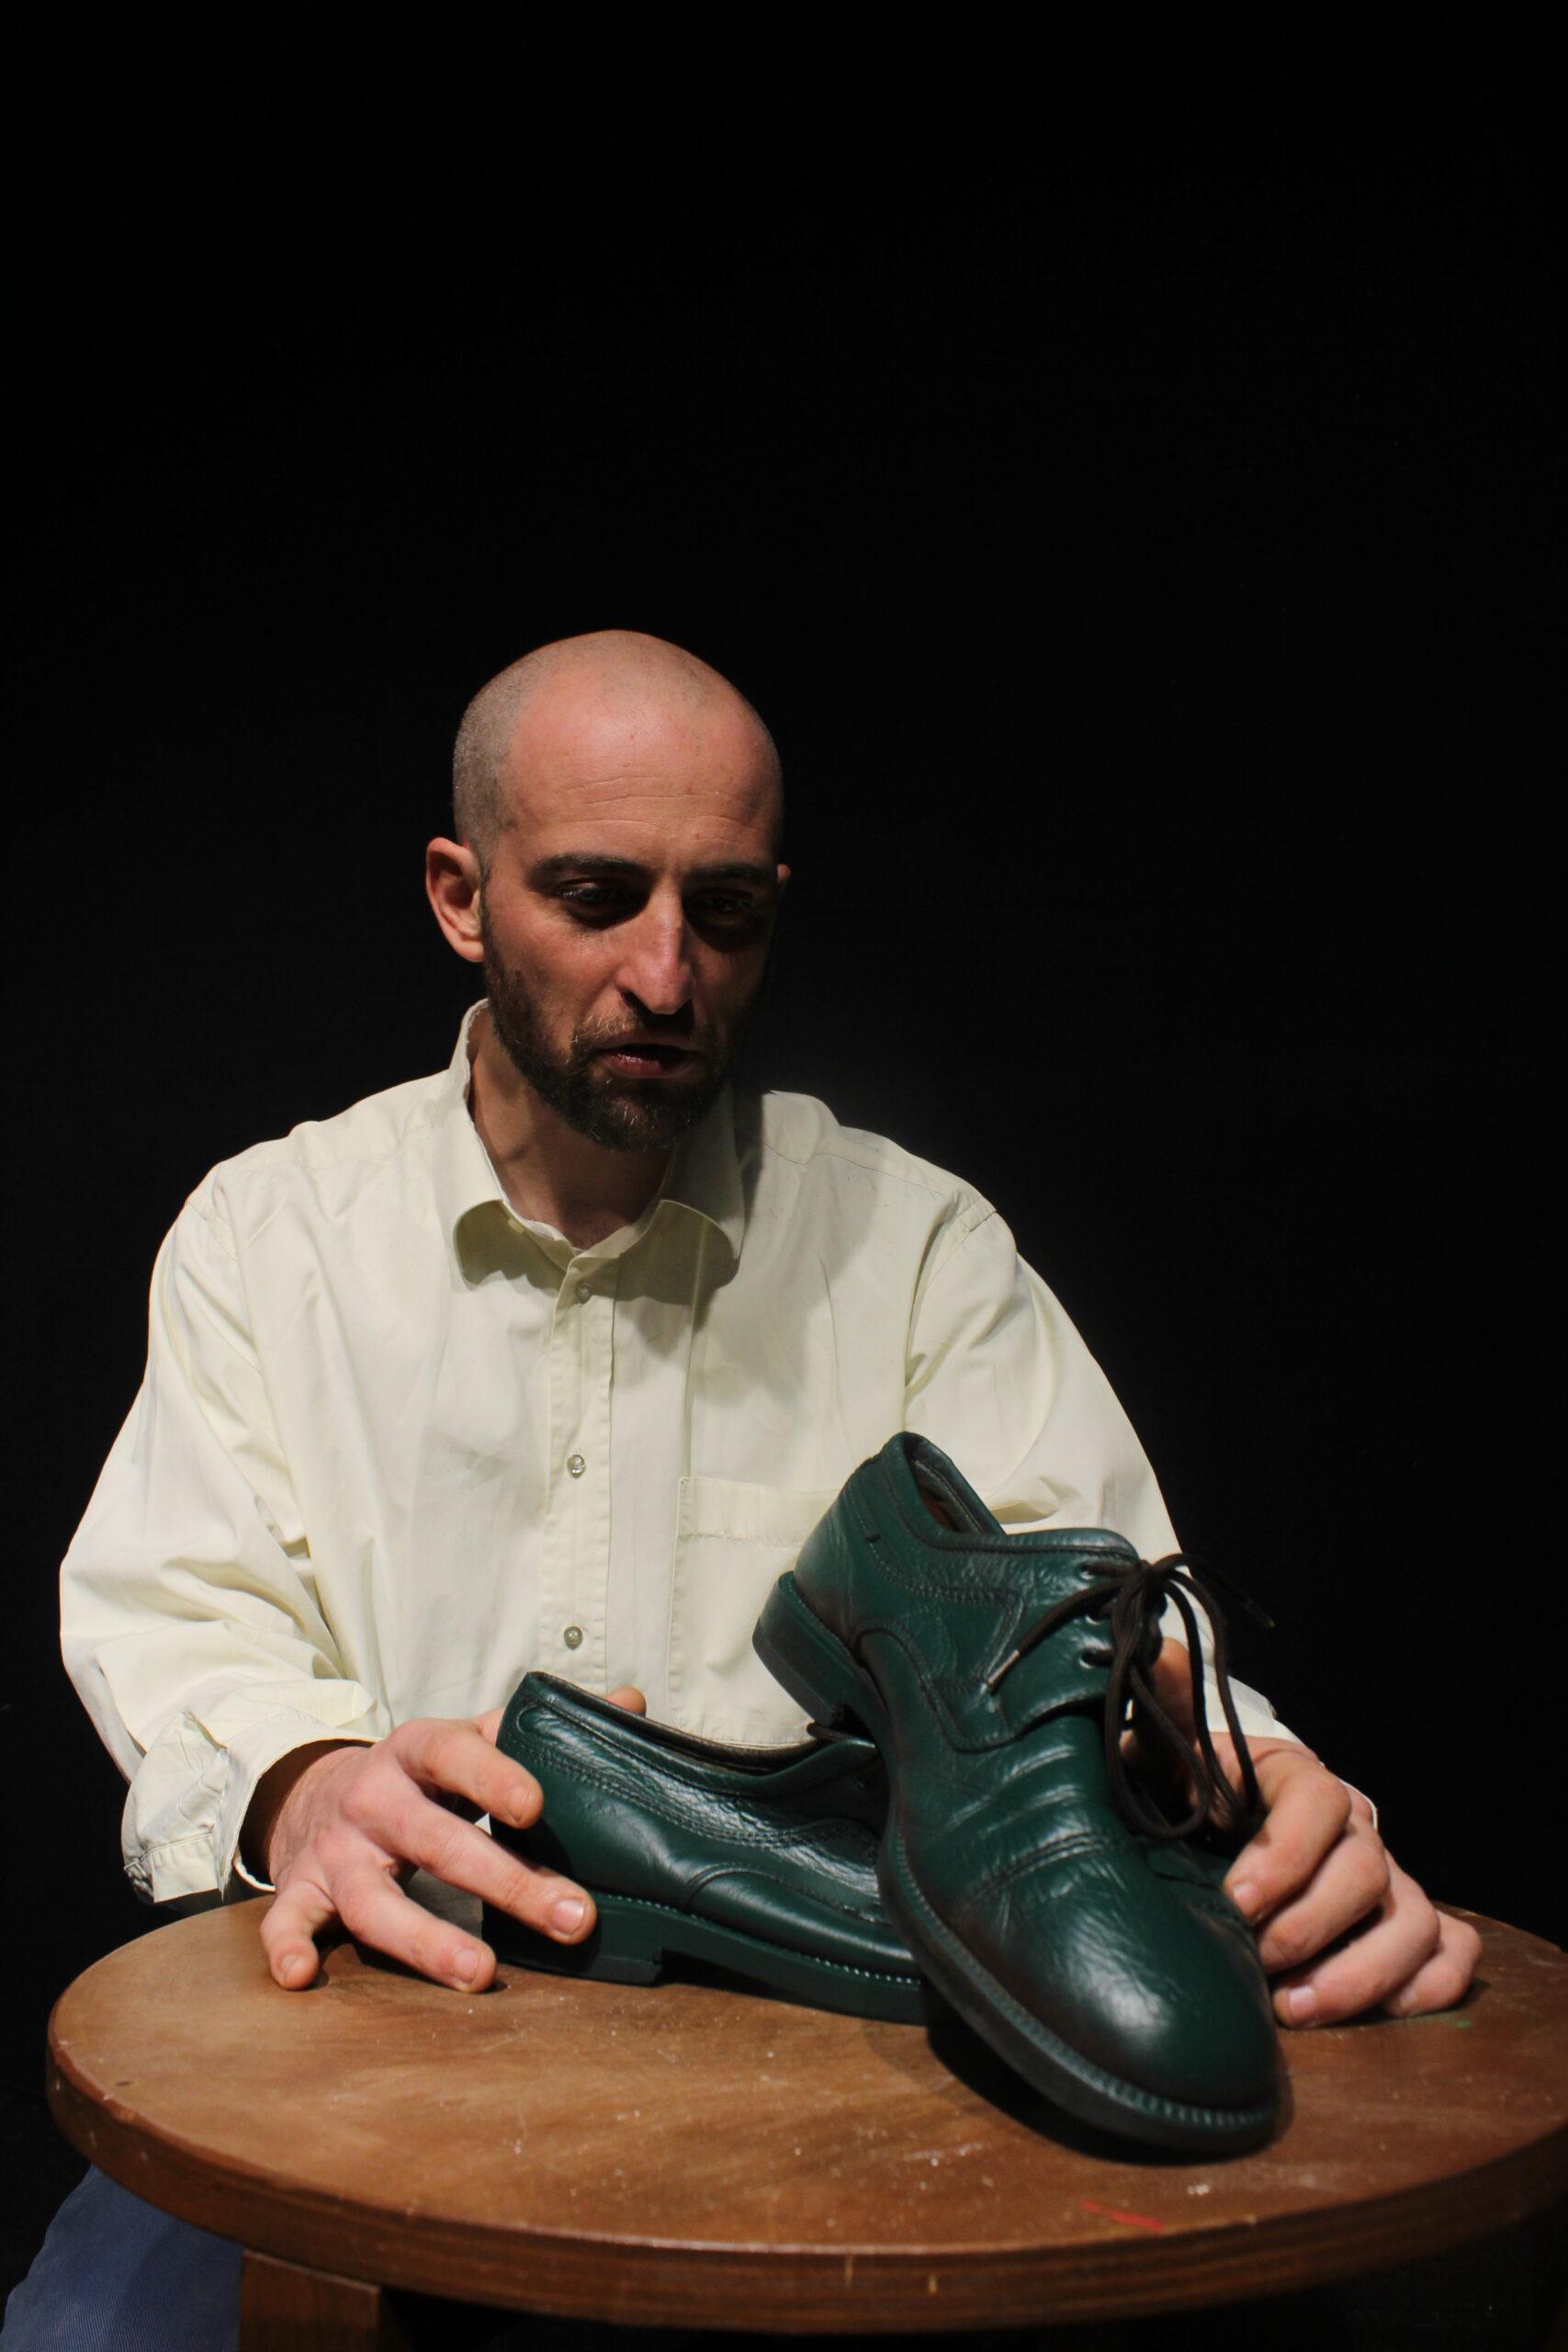 Le scarpe di vernice verde